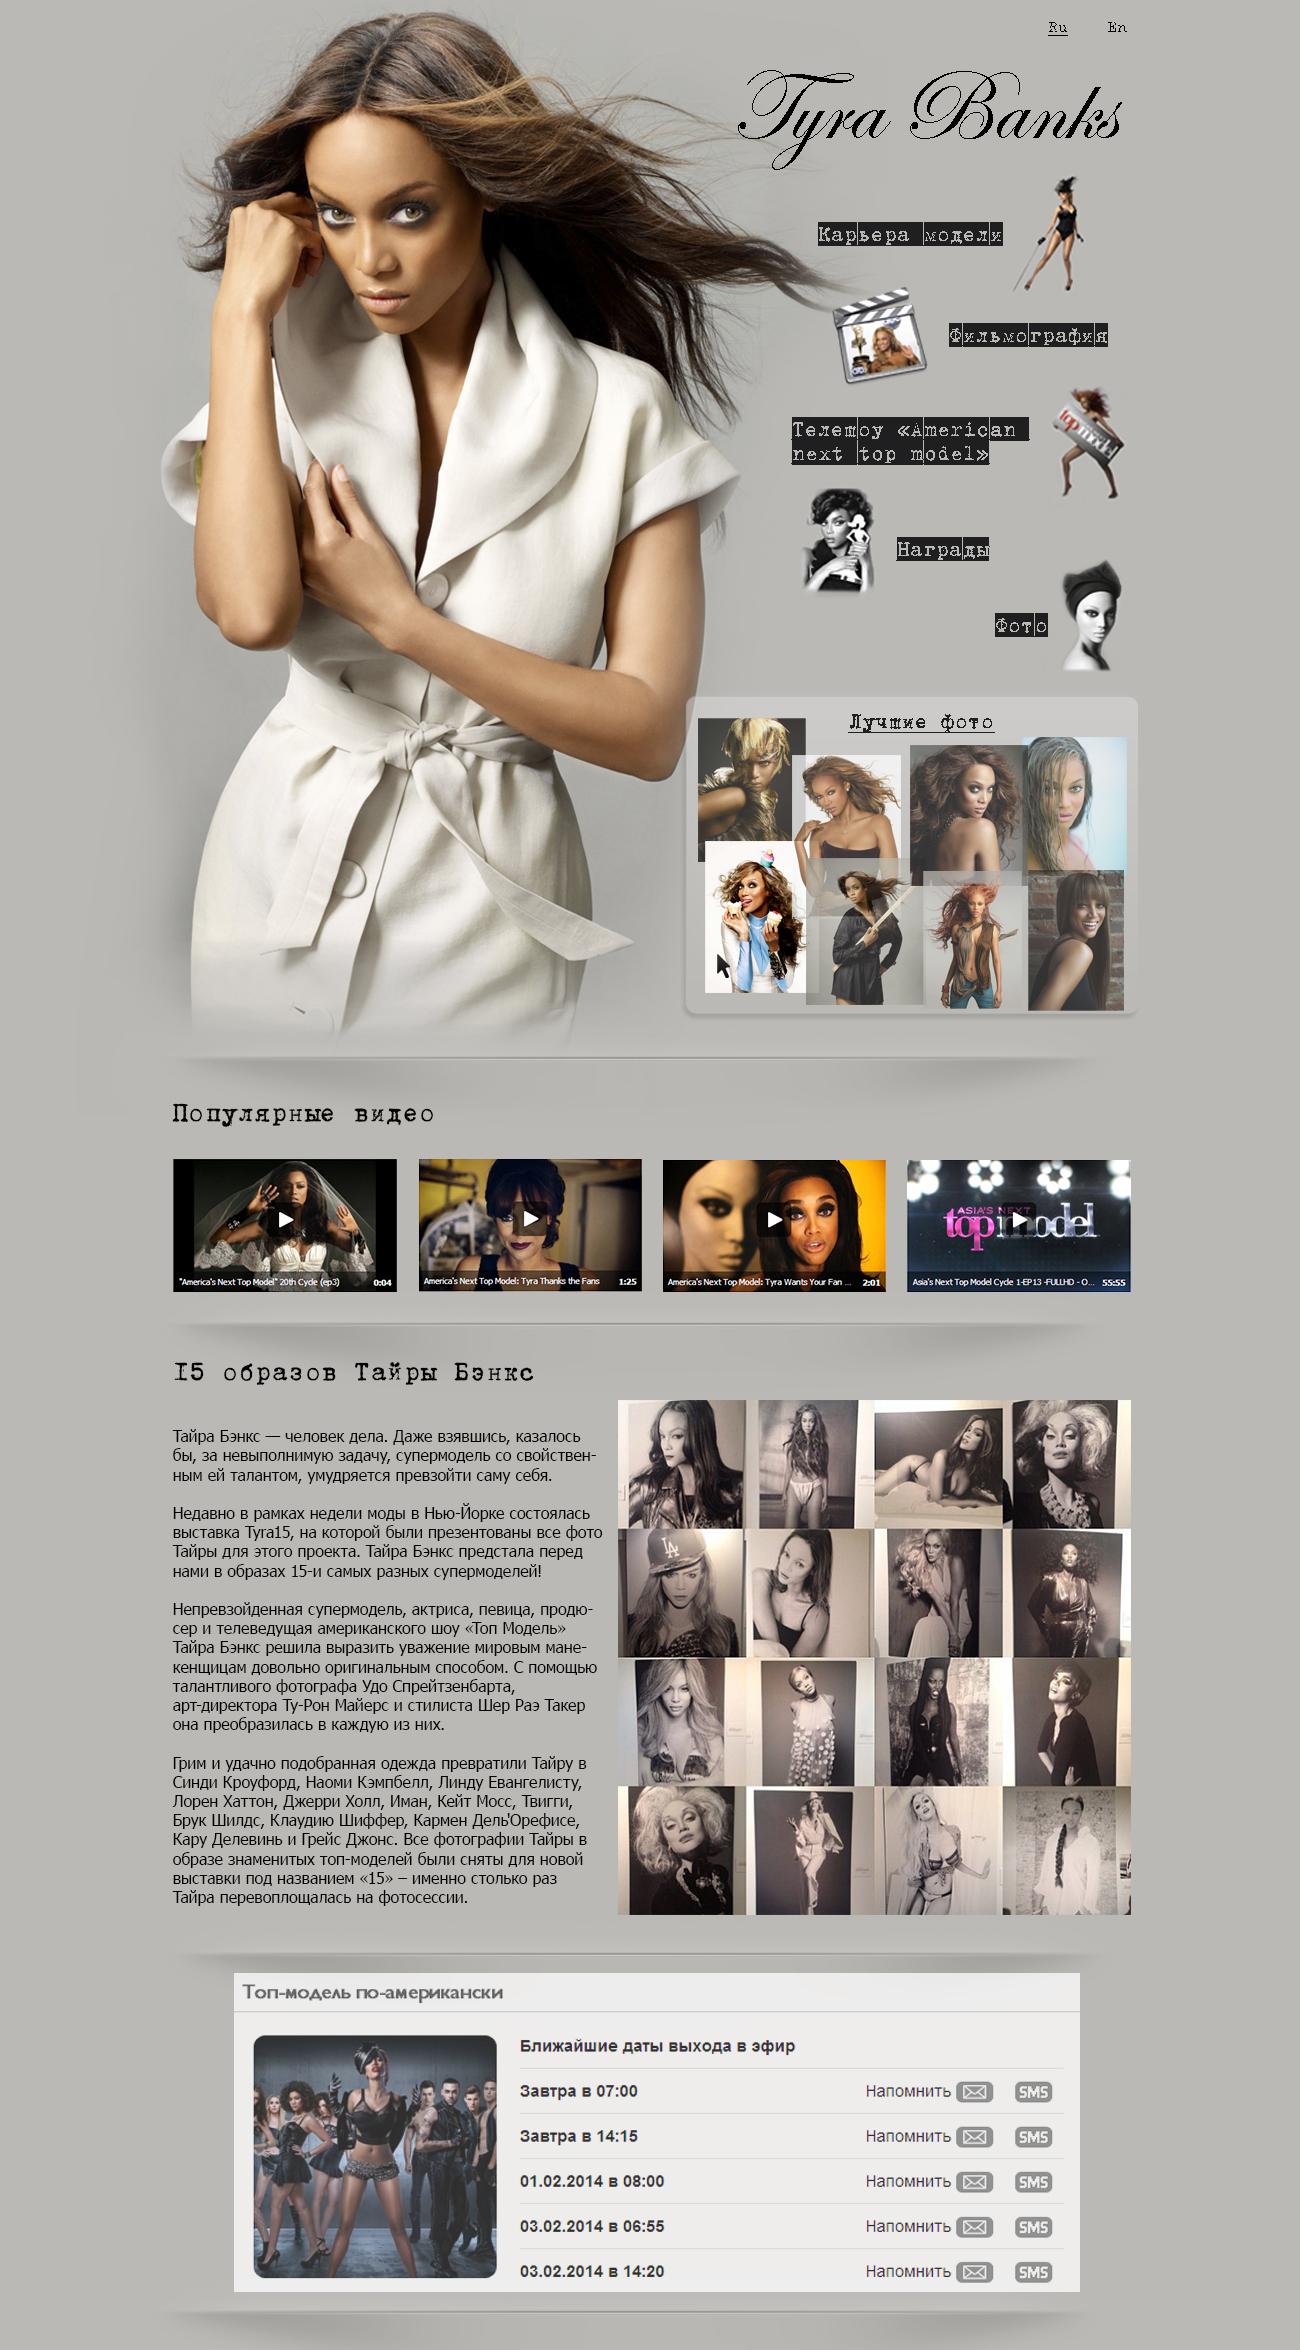 Дизайн сайта модели Tyra Banks